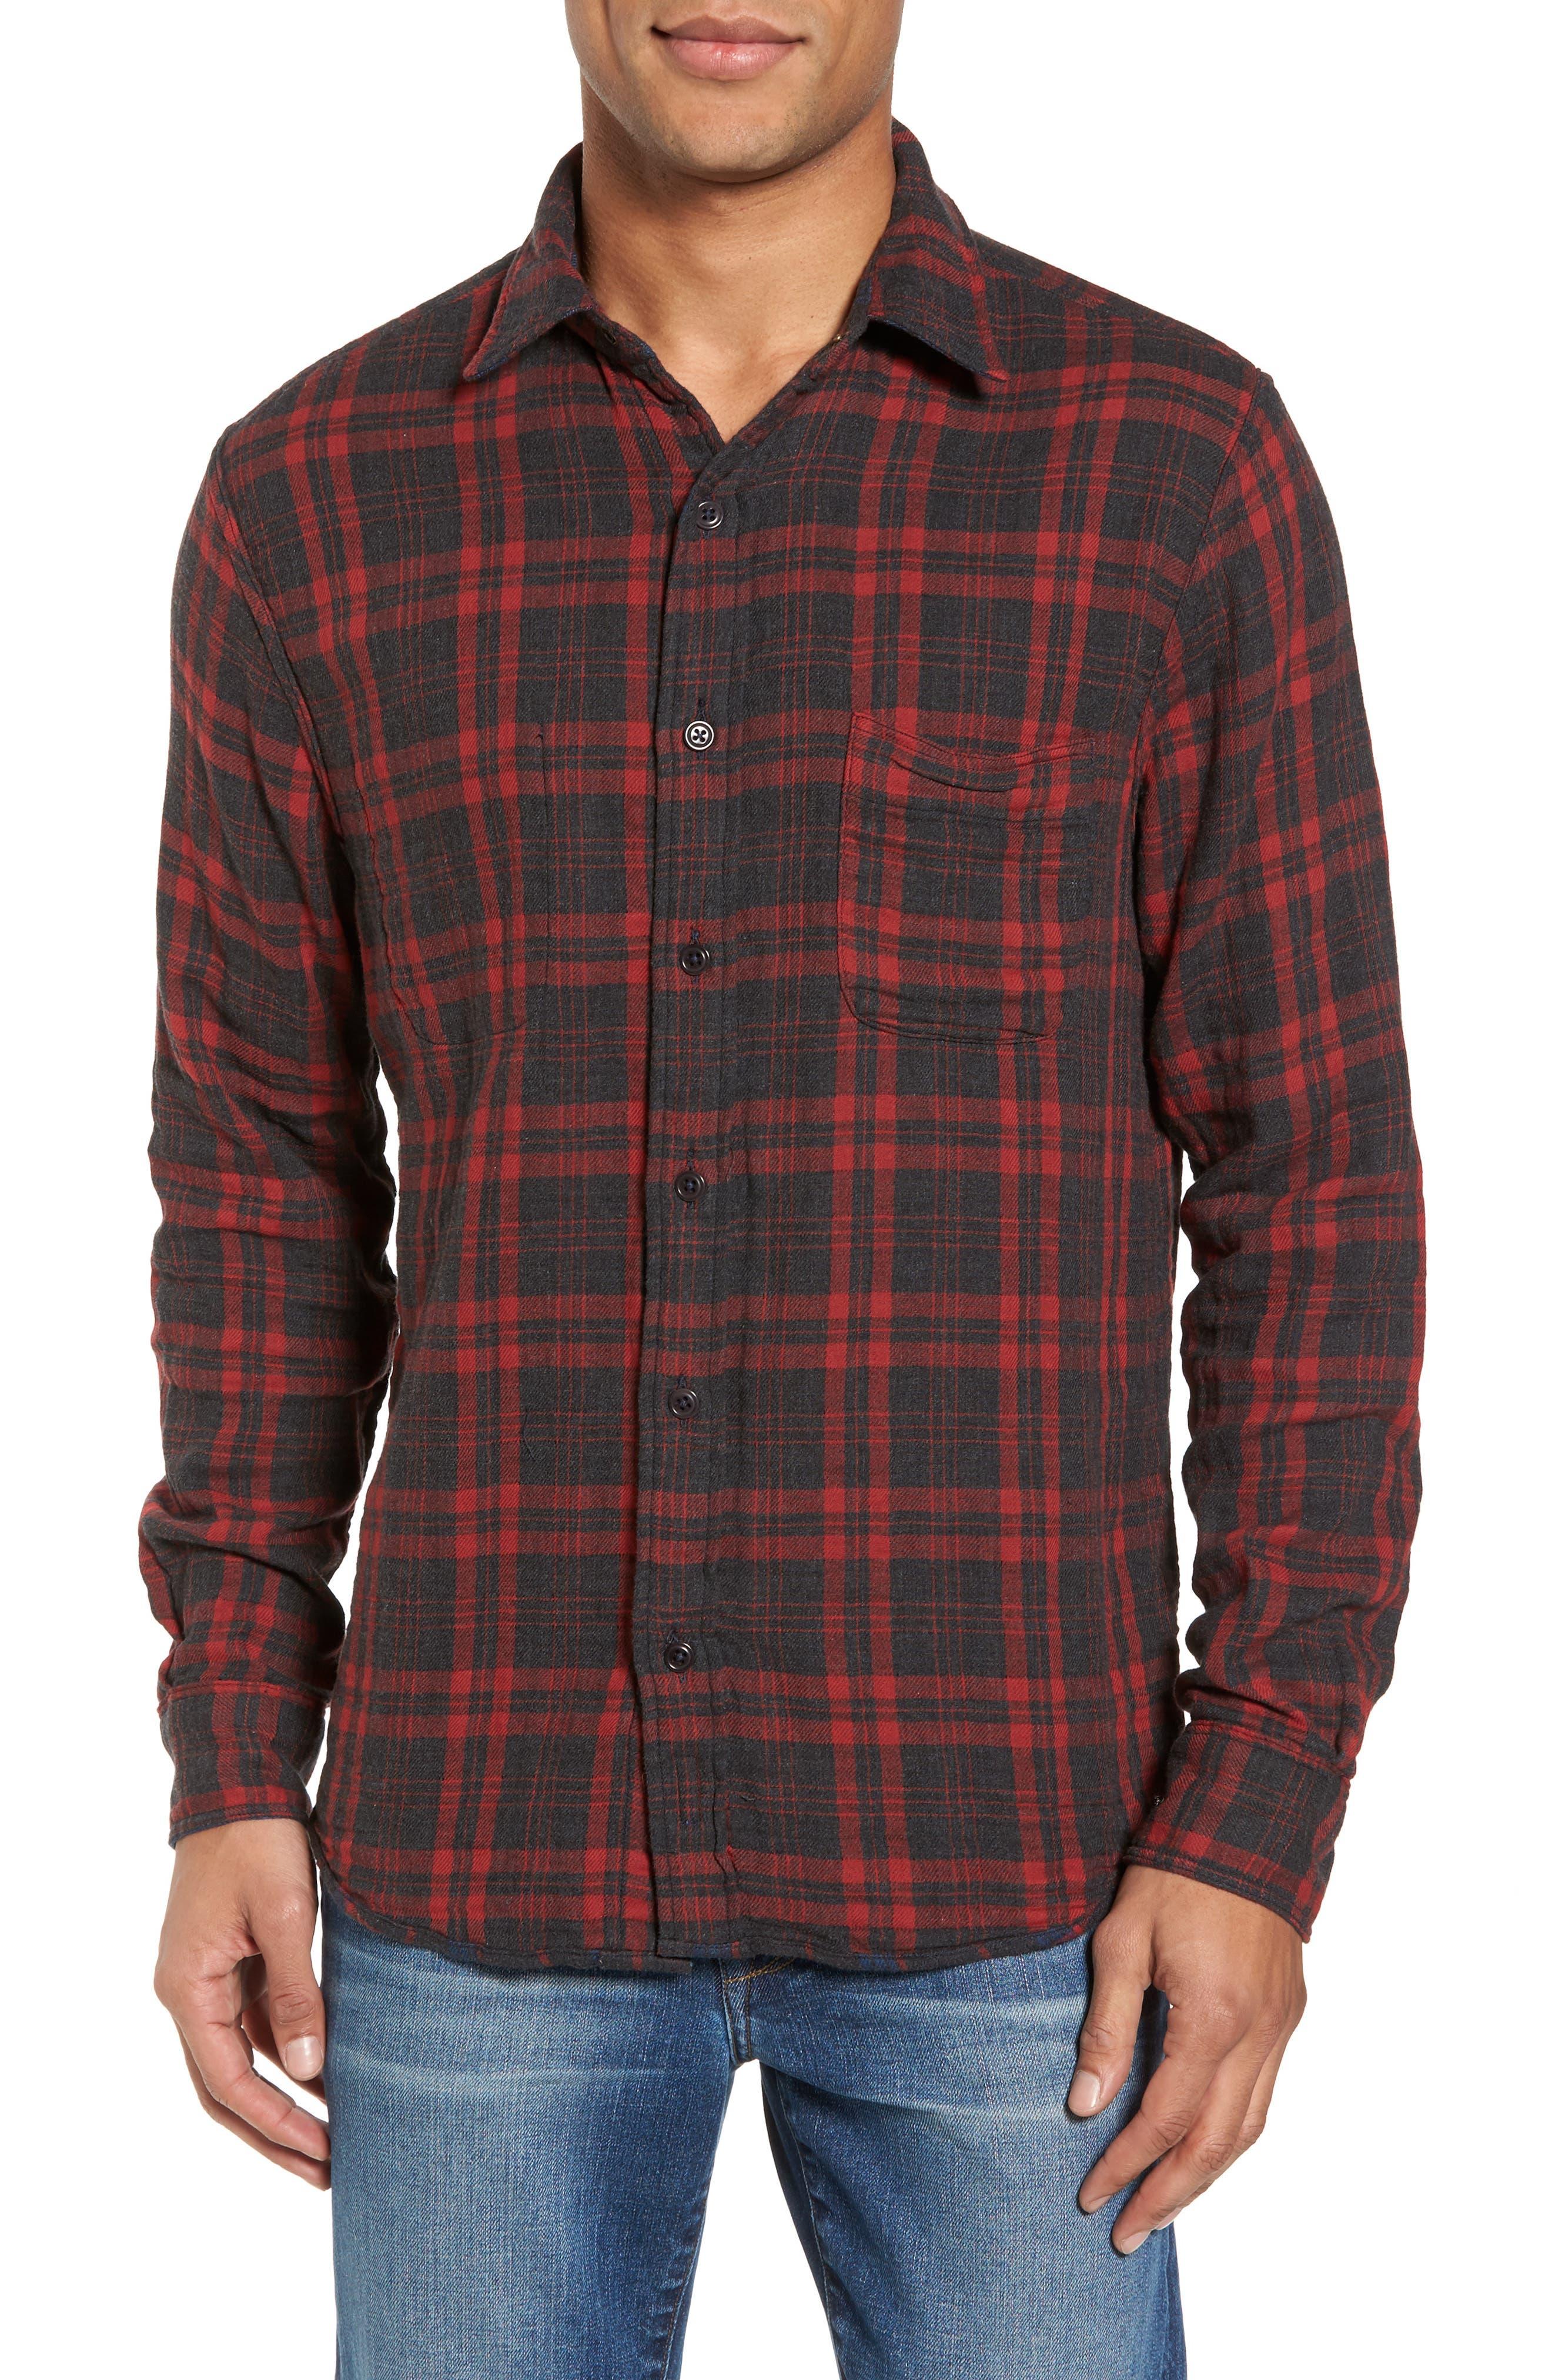 Belmar Plaid Reversible Sport Shirt,                             Alternate thumbnail 2, color,                             Charcoal Blue Red Plaid